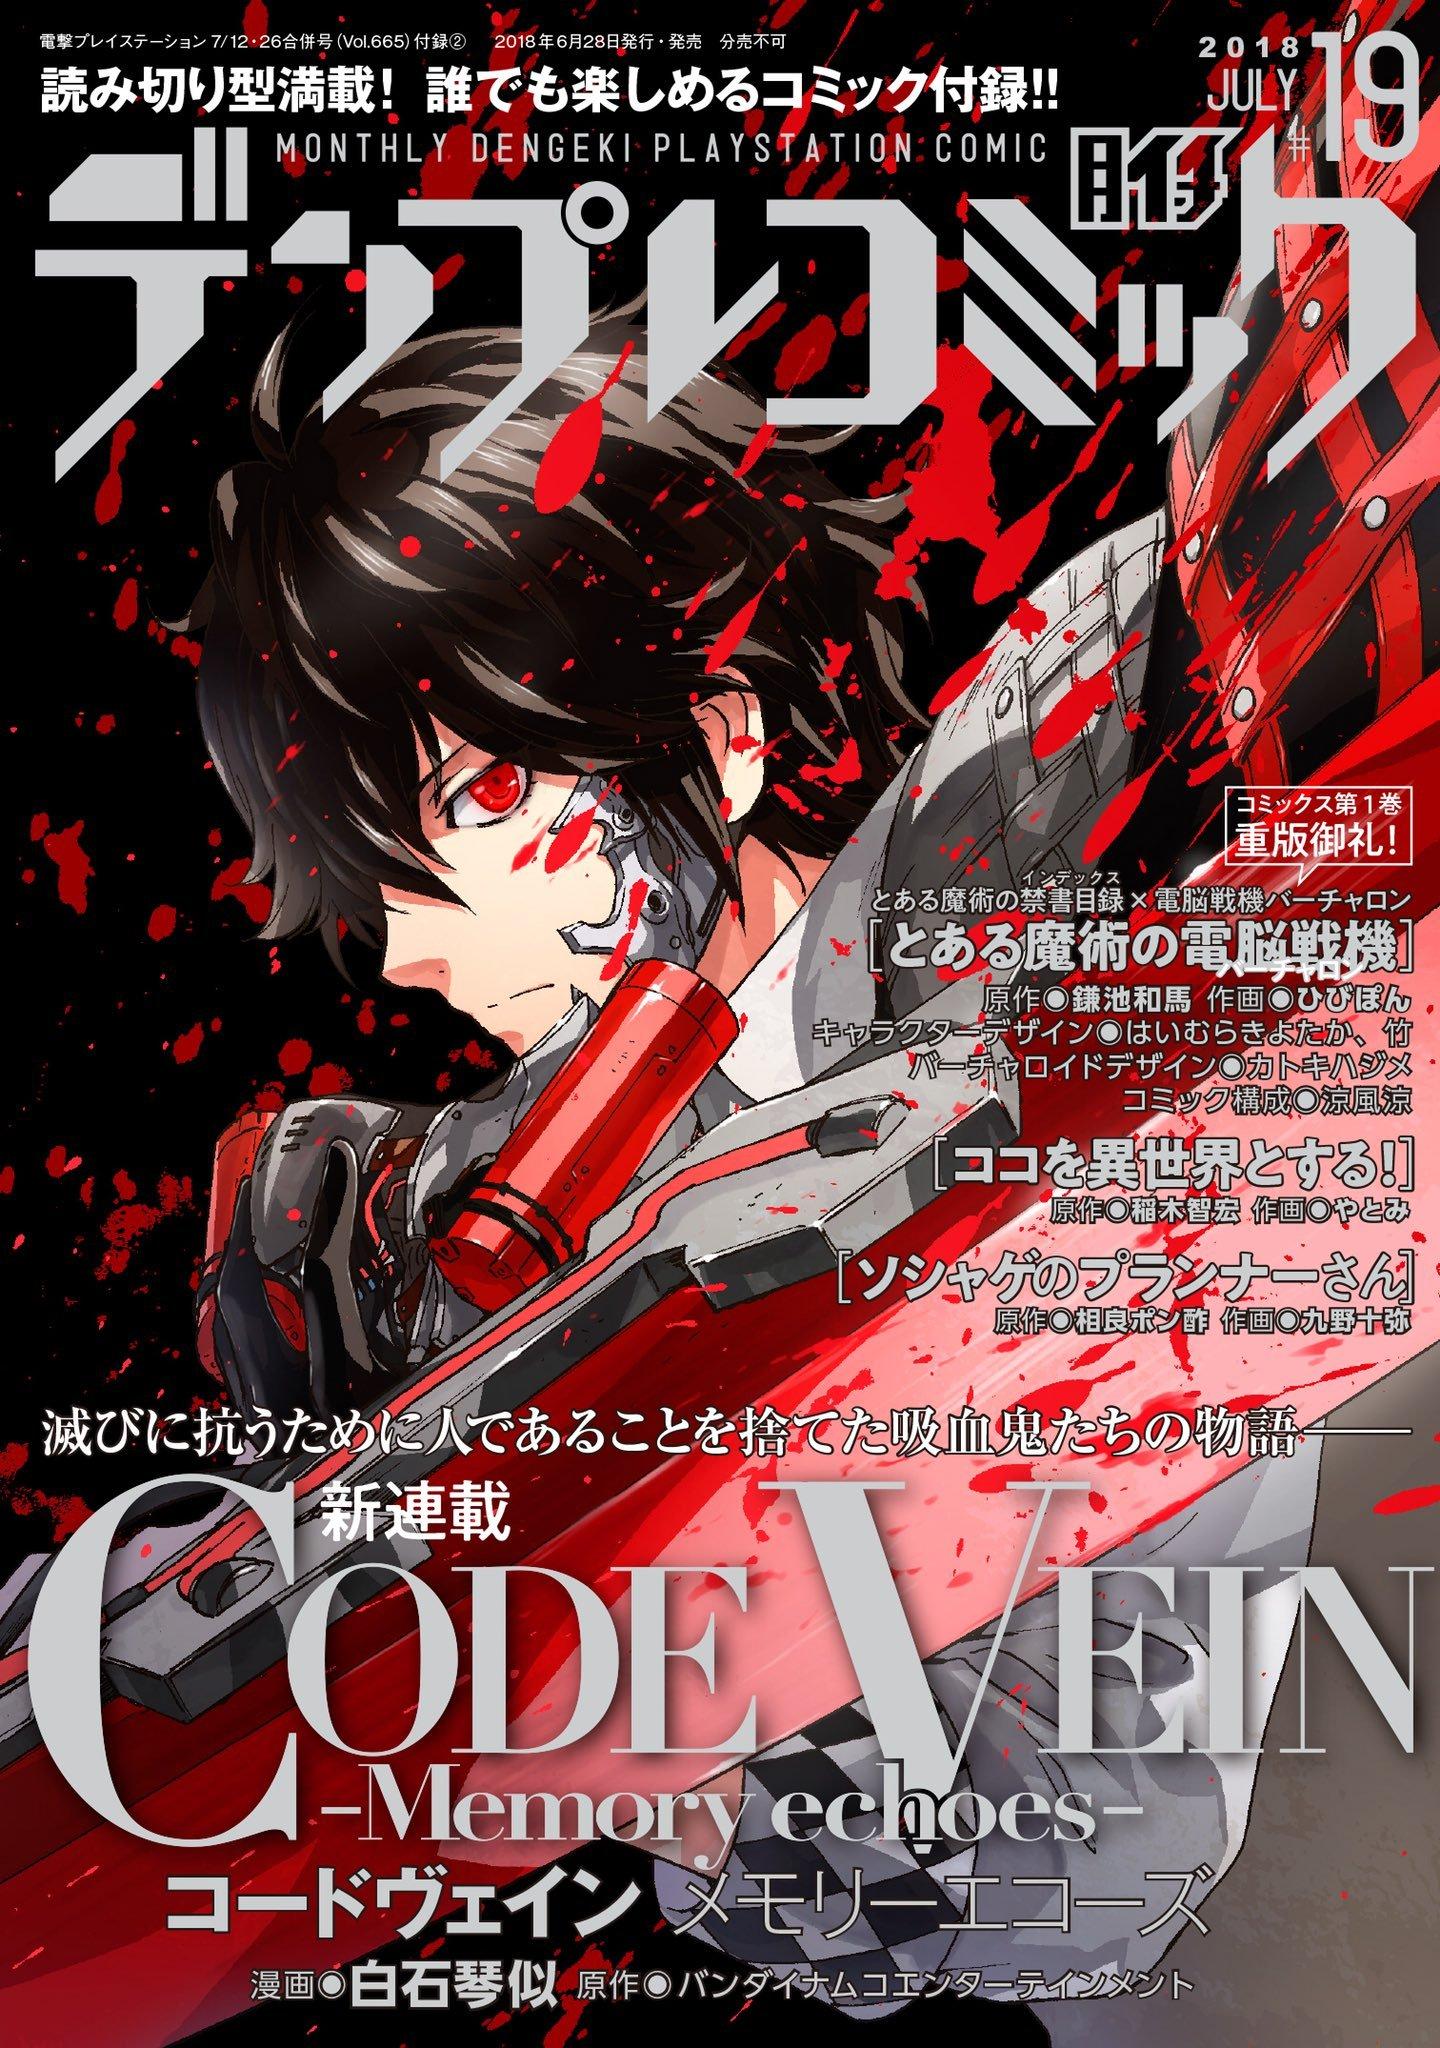 Denplay Comic 019 (Vol.665 supplement) (July 12/26, 2018)